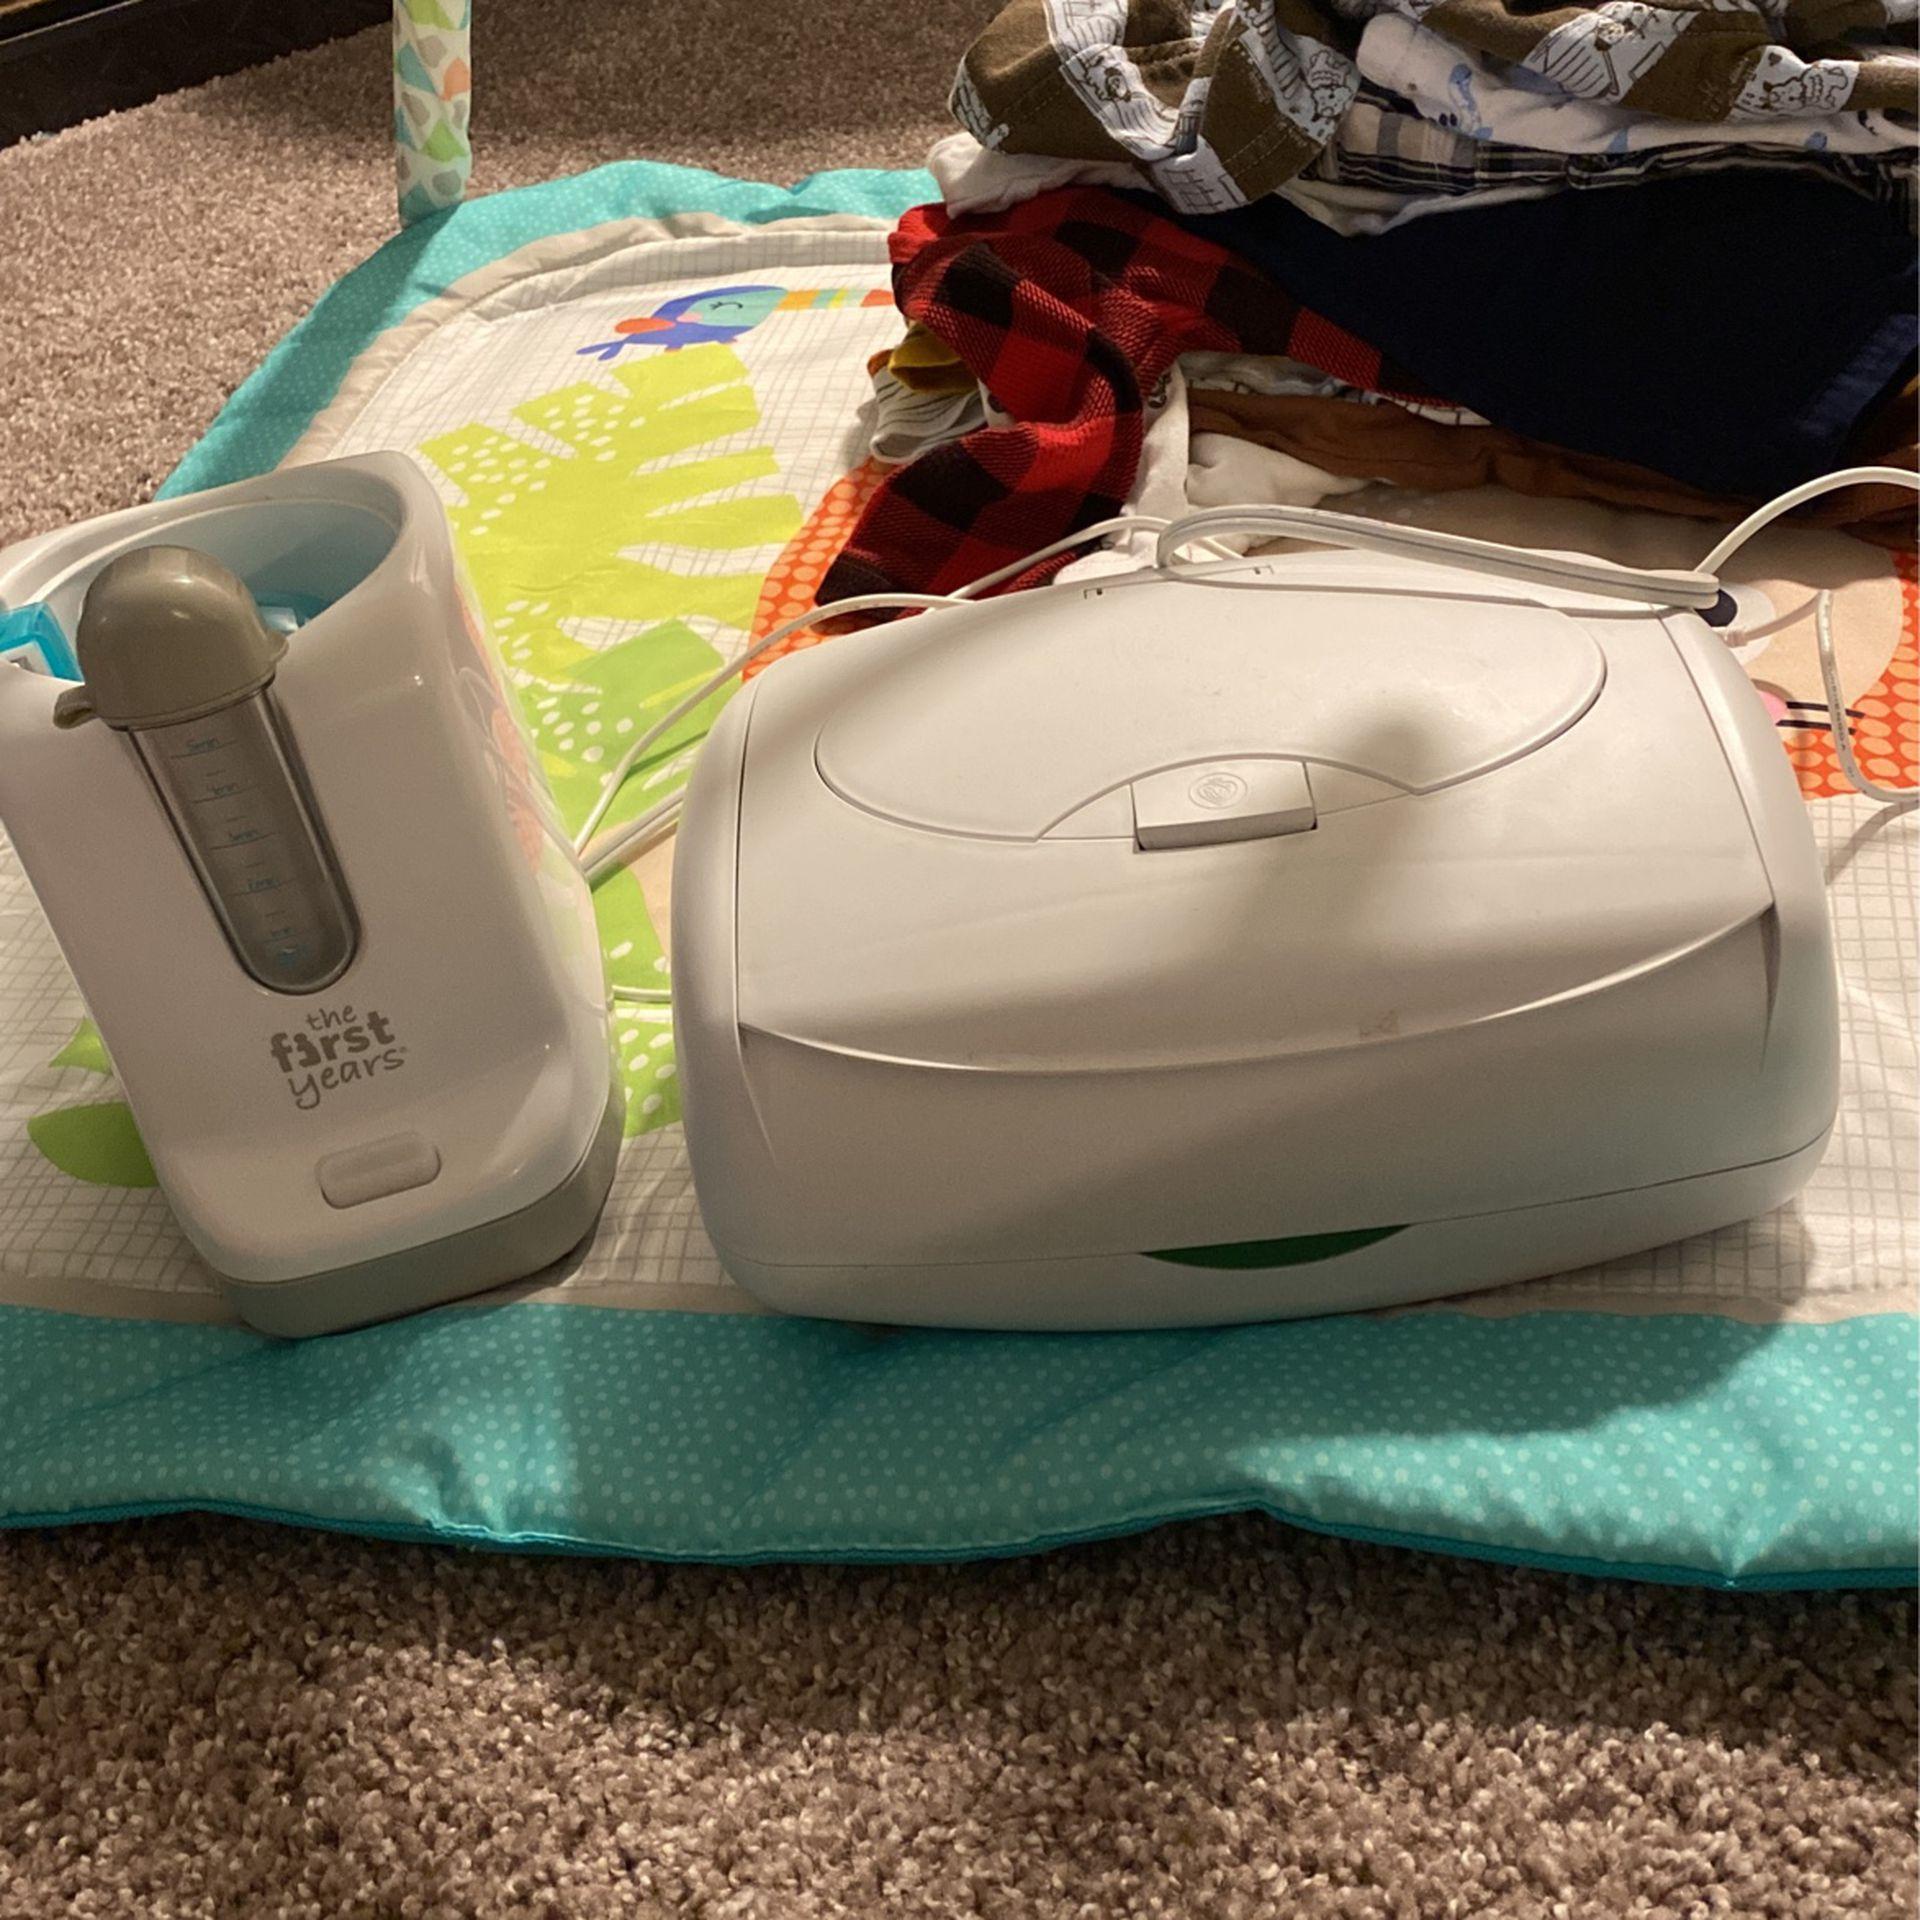 Wipe Warmer And Bottle Warmer/Sanitizer